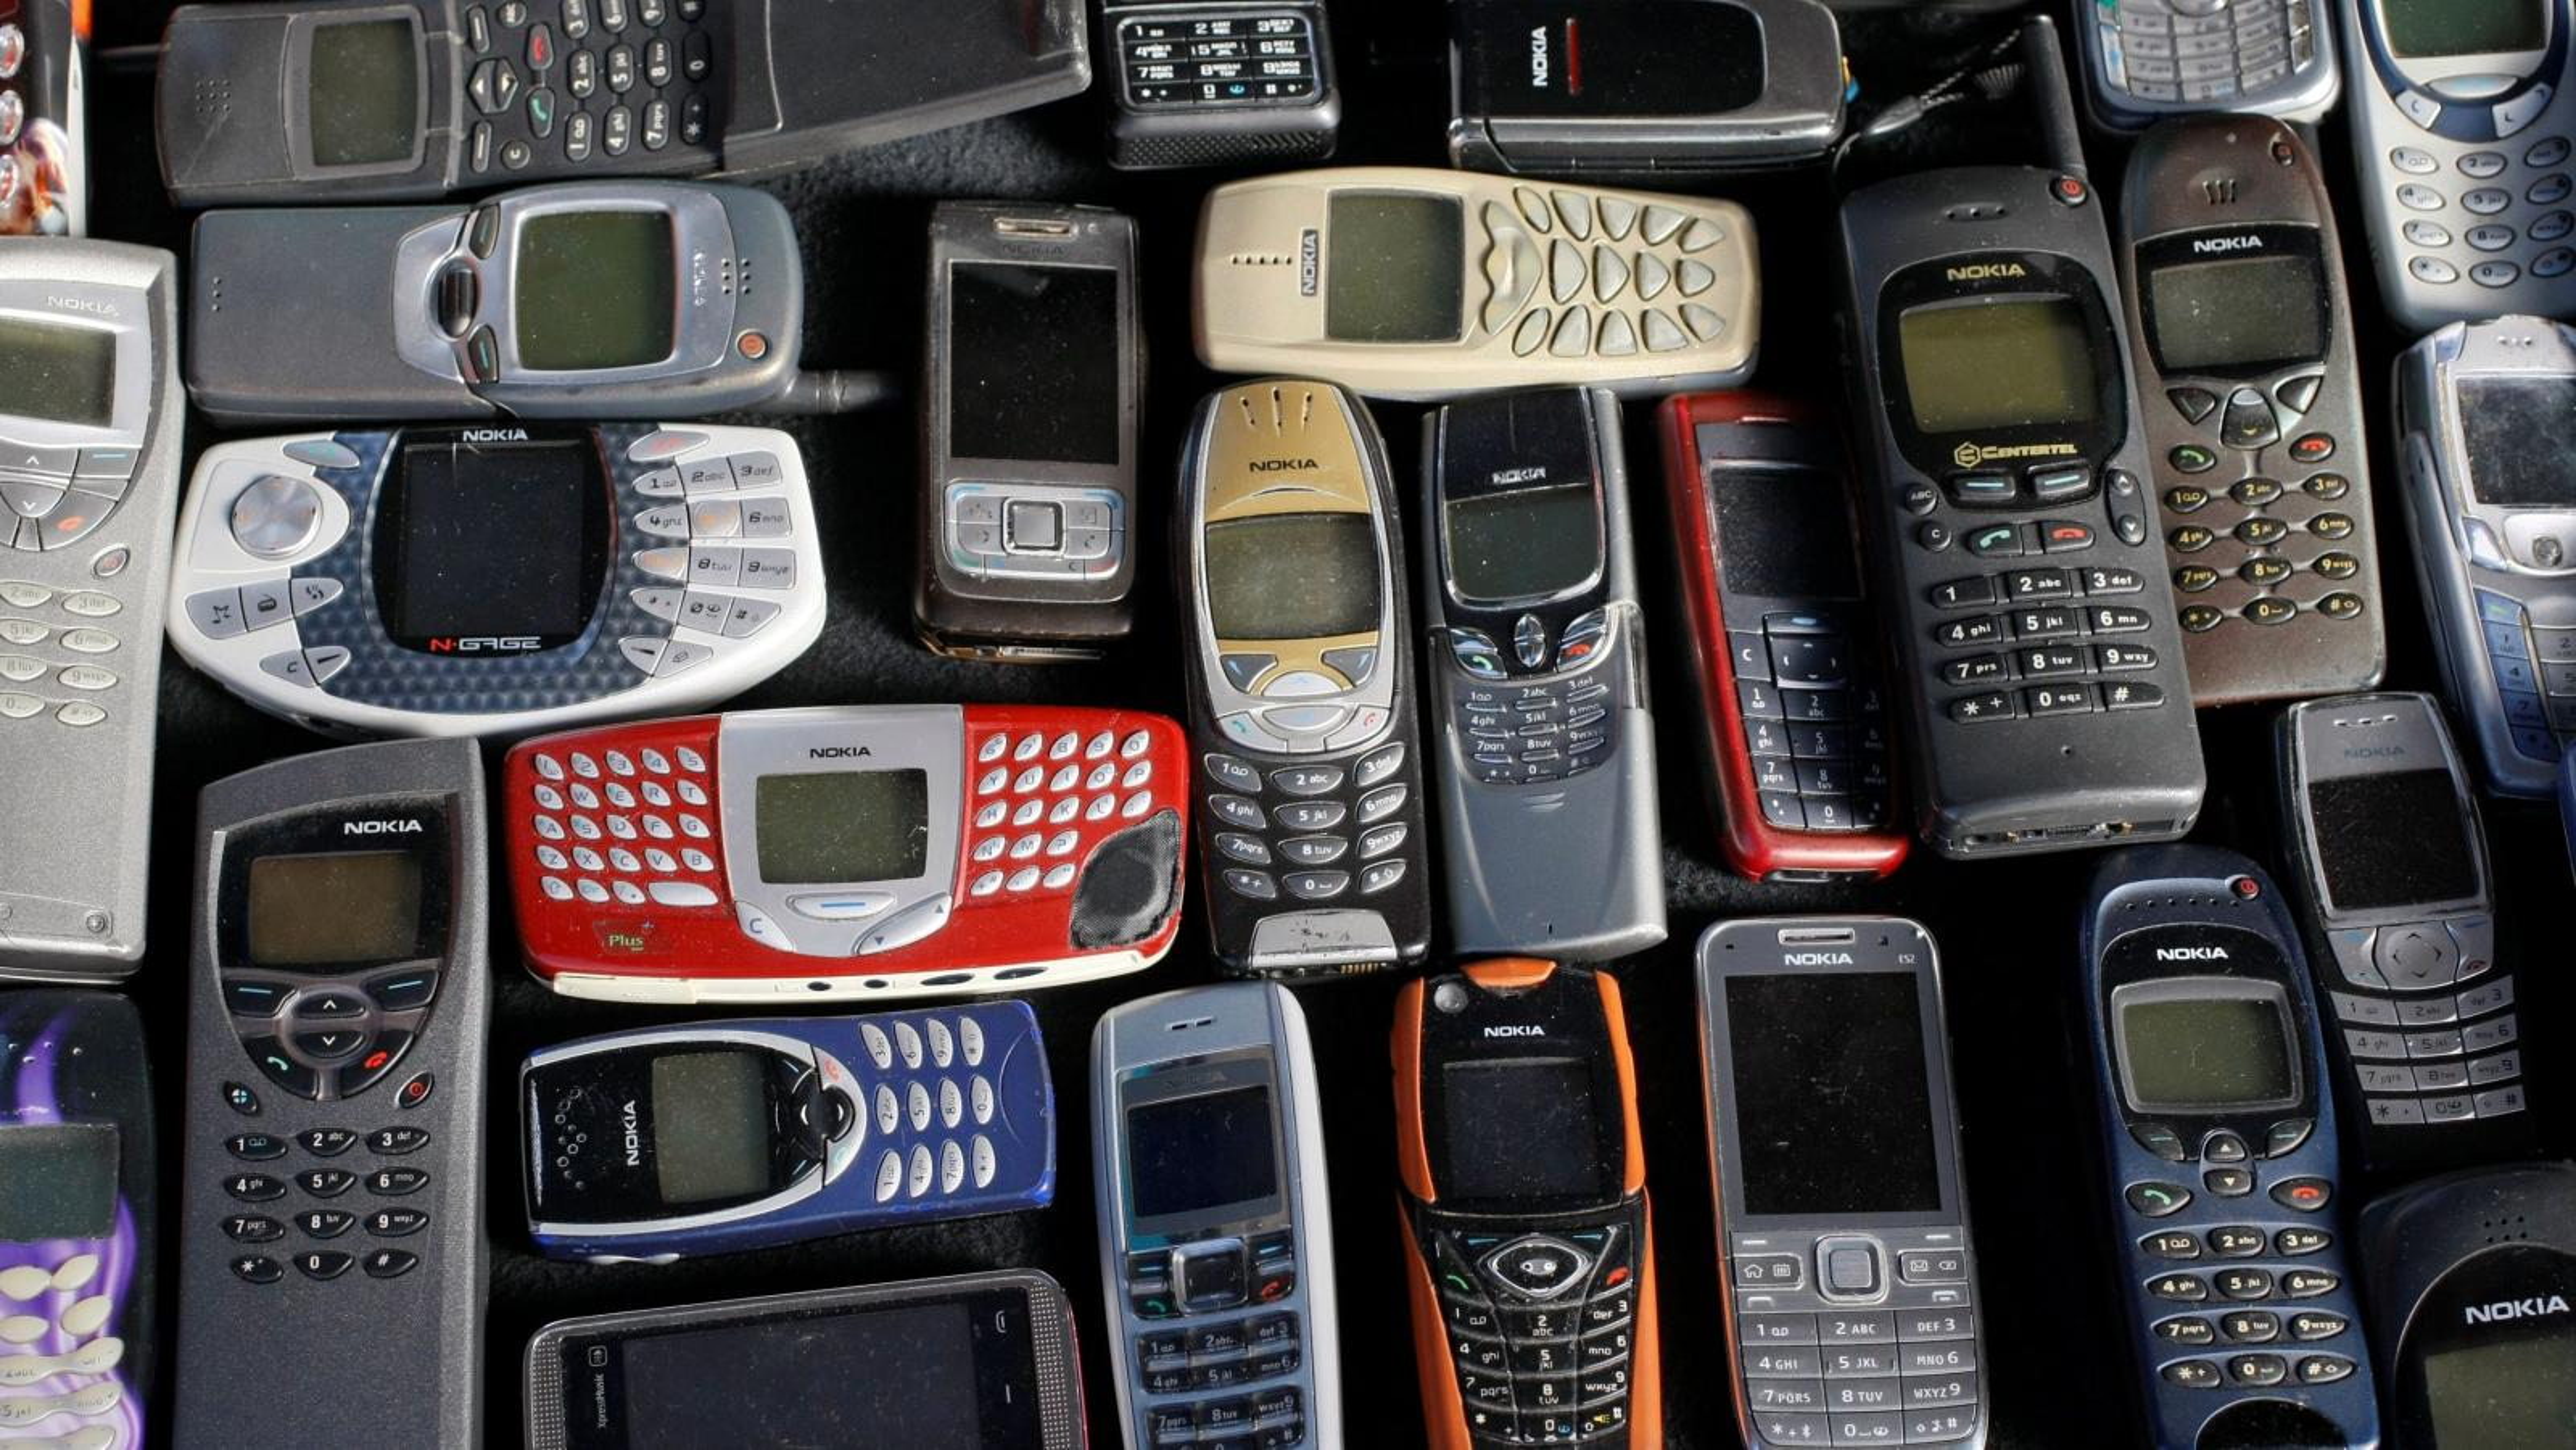 USSD mobile technology is revolutionizing Africa — Quartz Africa